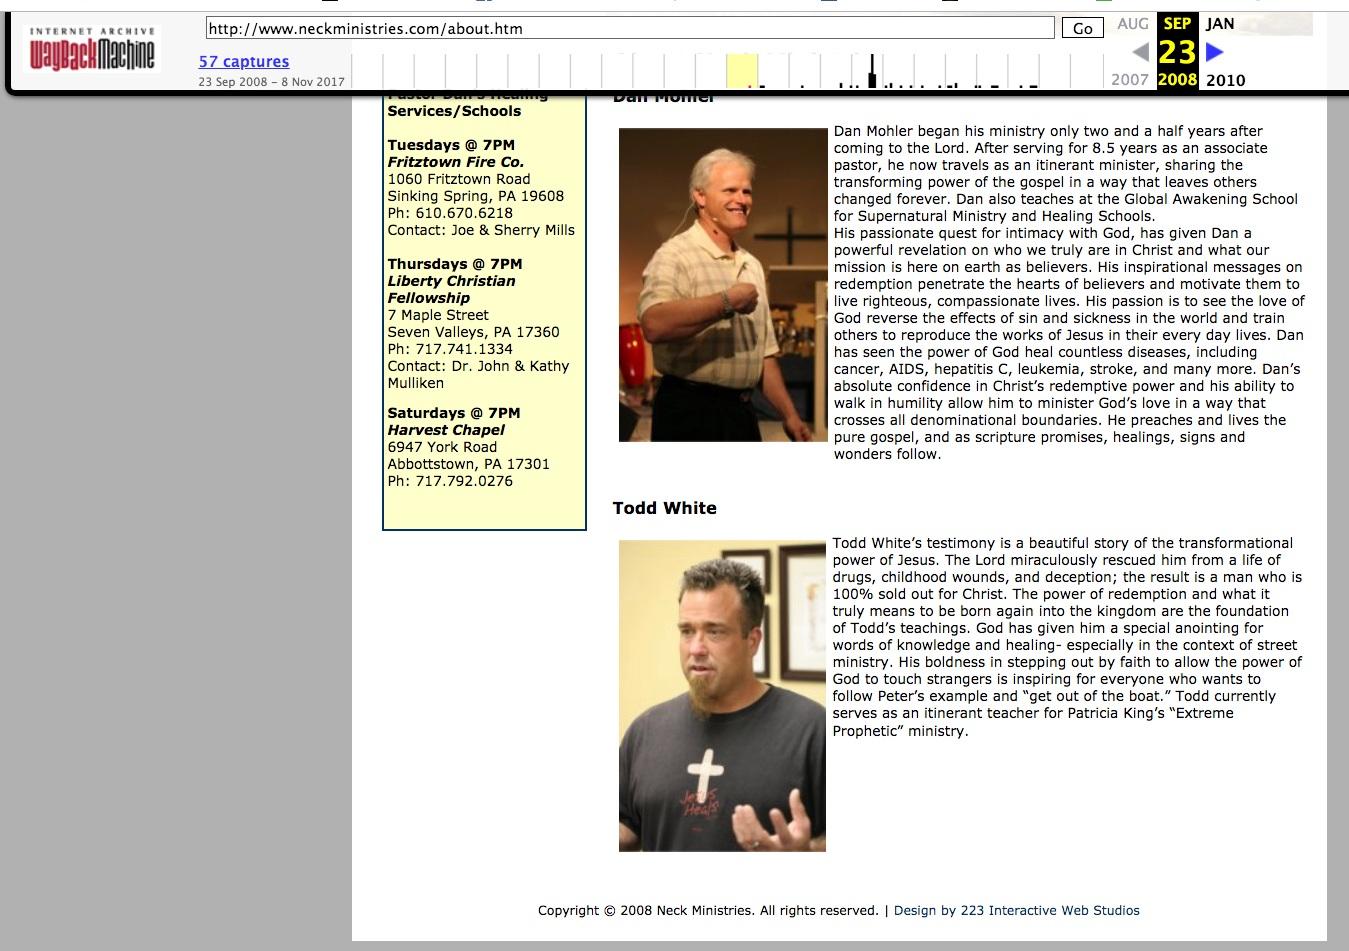 DanMohlerToddWhiteSept232008Archive+copy.jpg